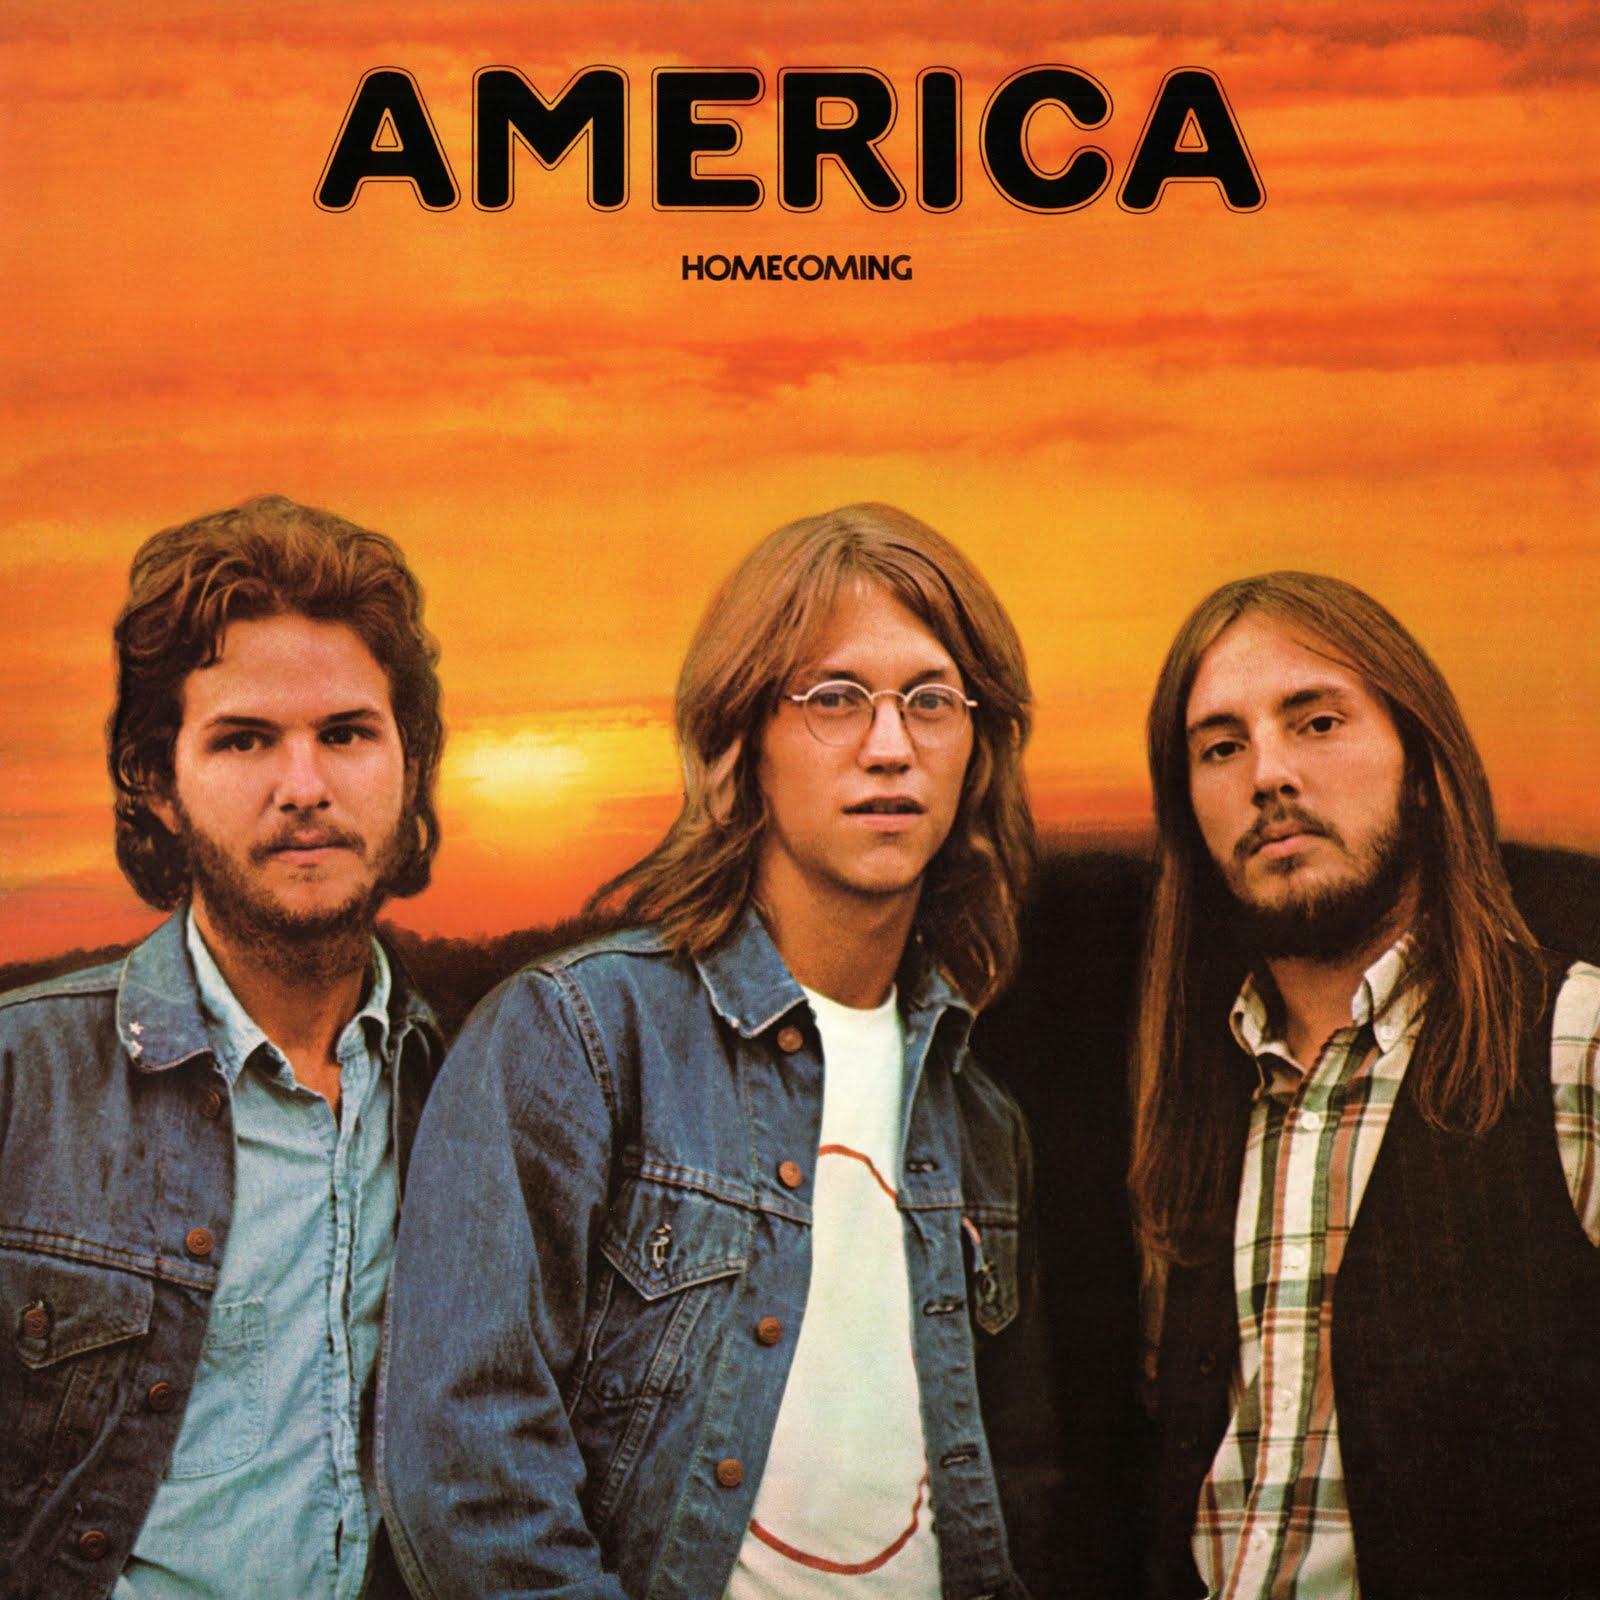 Risultati immagini per america gruppo musicale